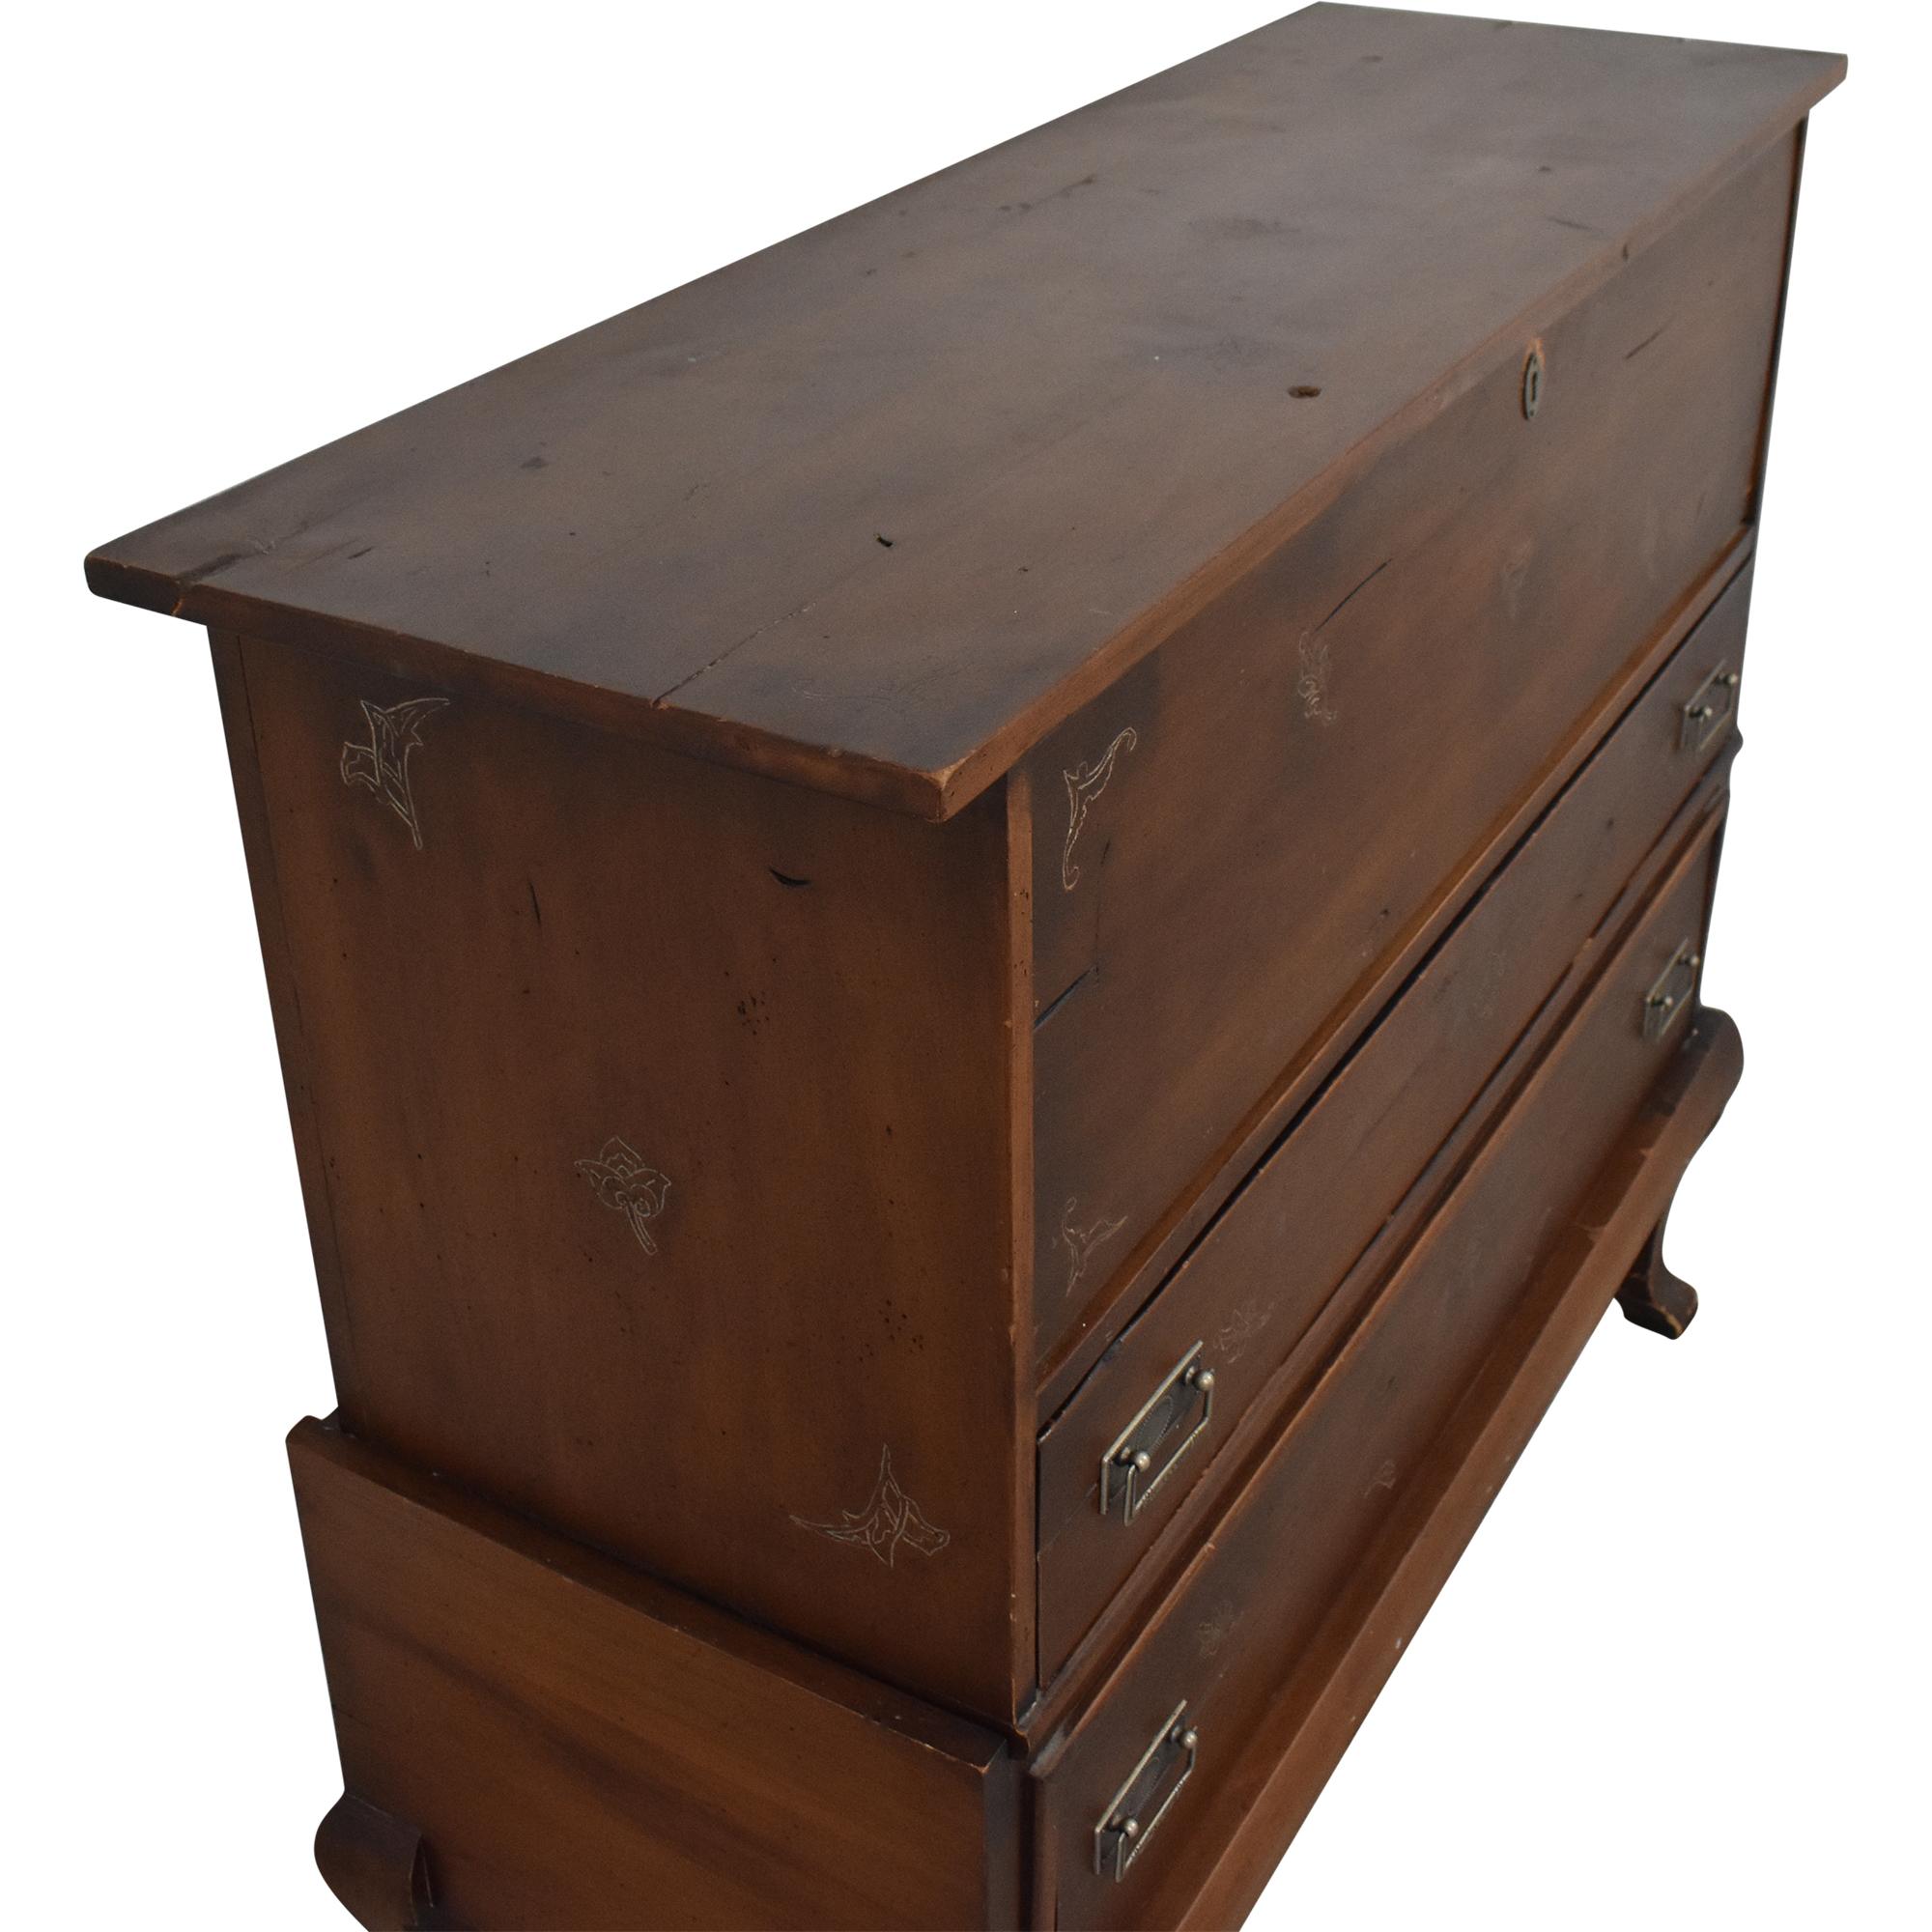 Vintage Chest of Drawers / Storage